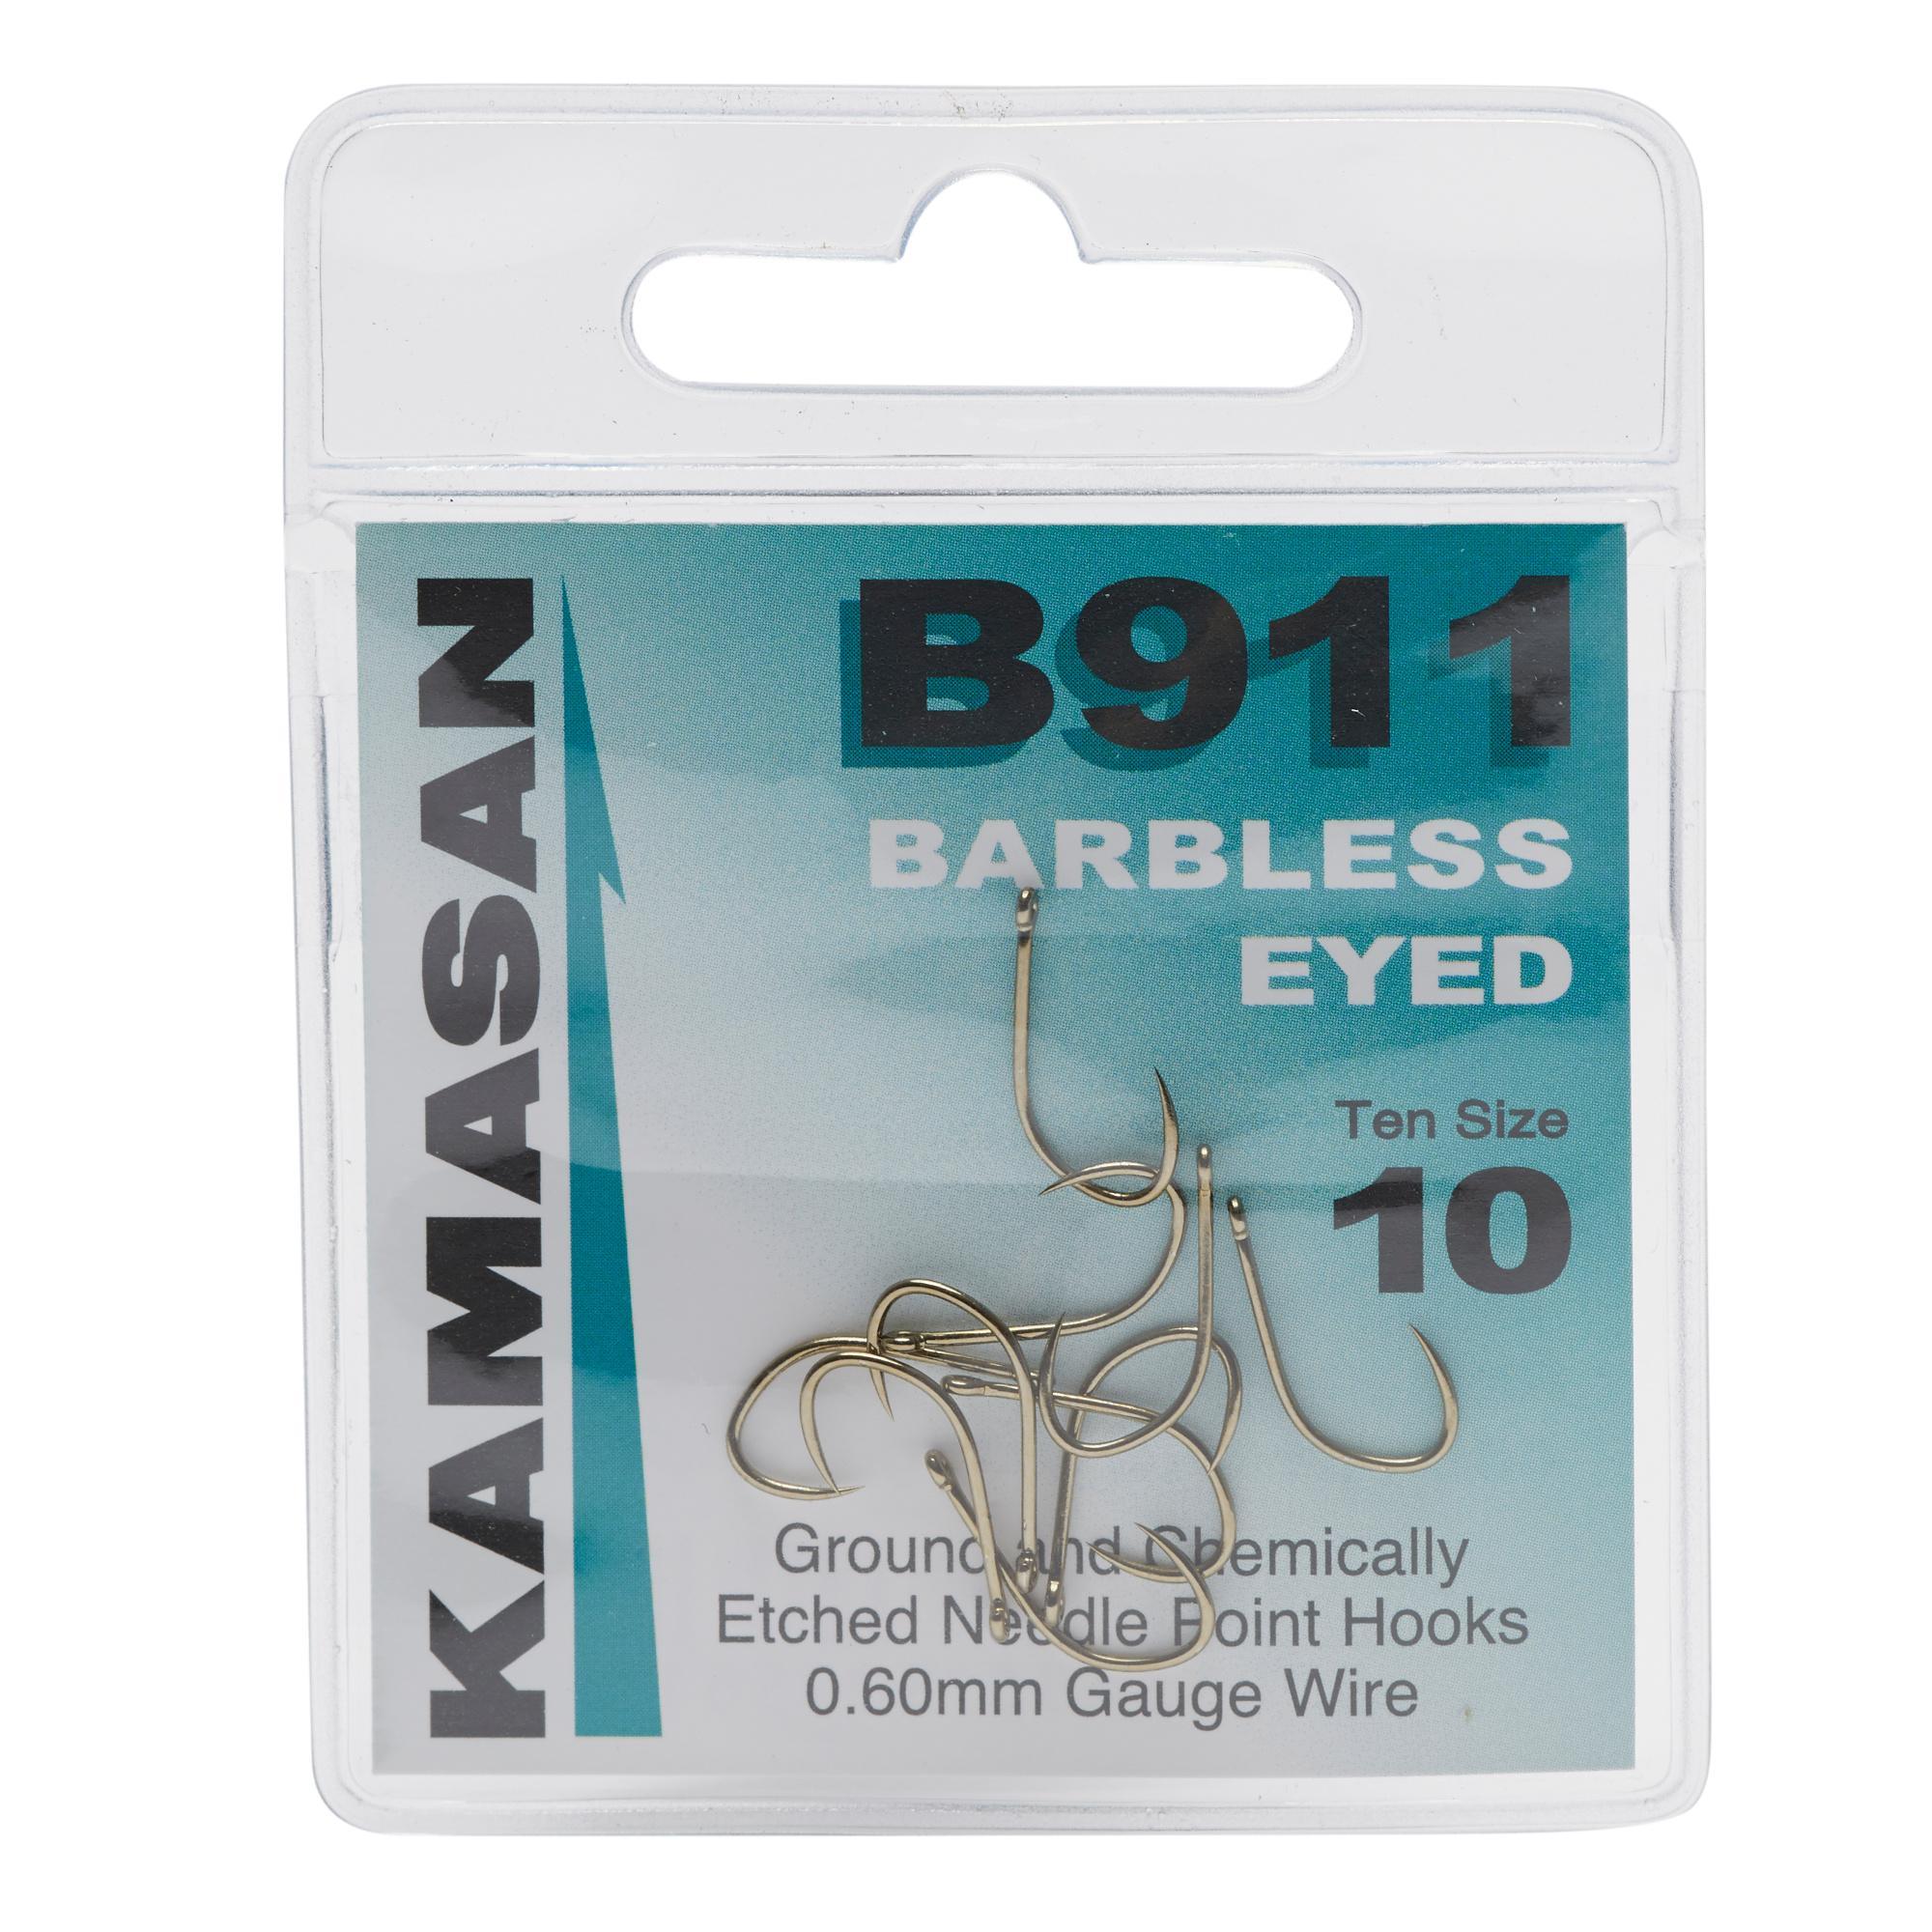 Kamasan Kamasan B911 Extra Strong Eyed Fishing Hooks - Size 10 - N/A, N/A